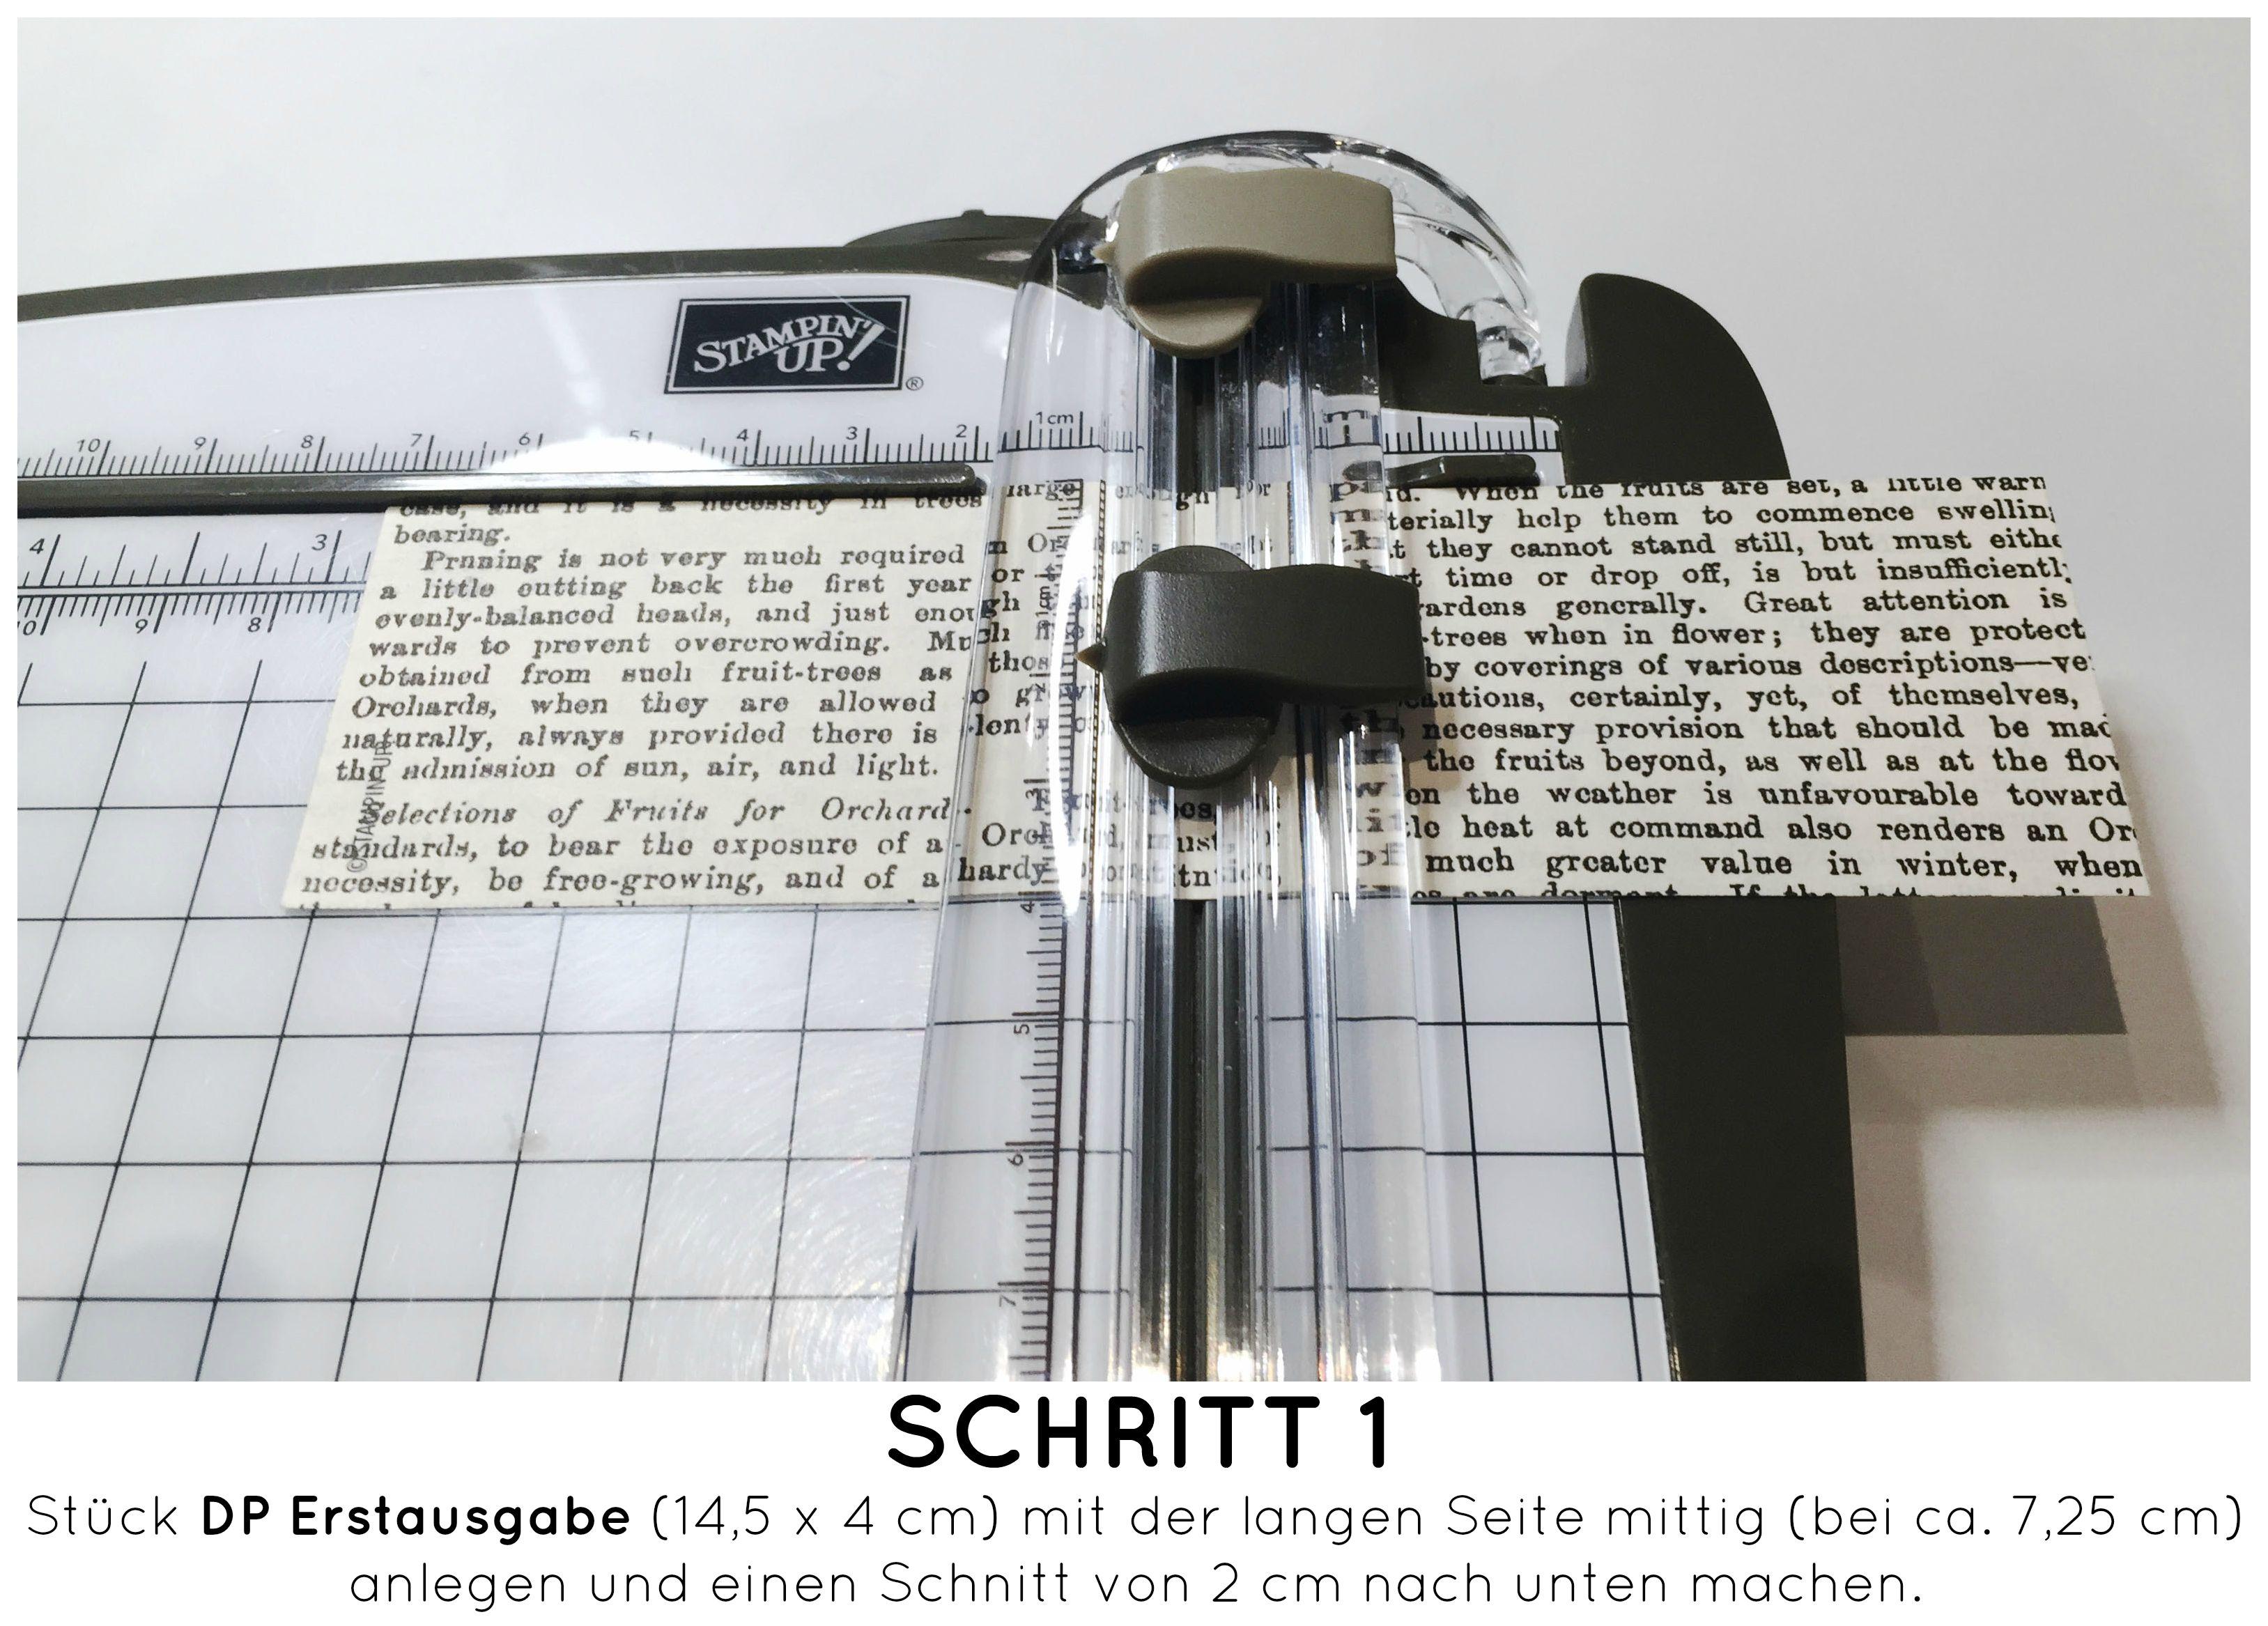 Stampin Up-Stempelherz-Dankeskarte-Zeig es am Montag Karte Danke Anleitung - Schritt 01